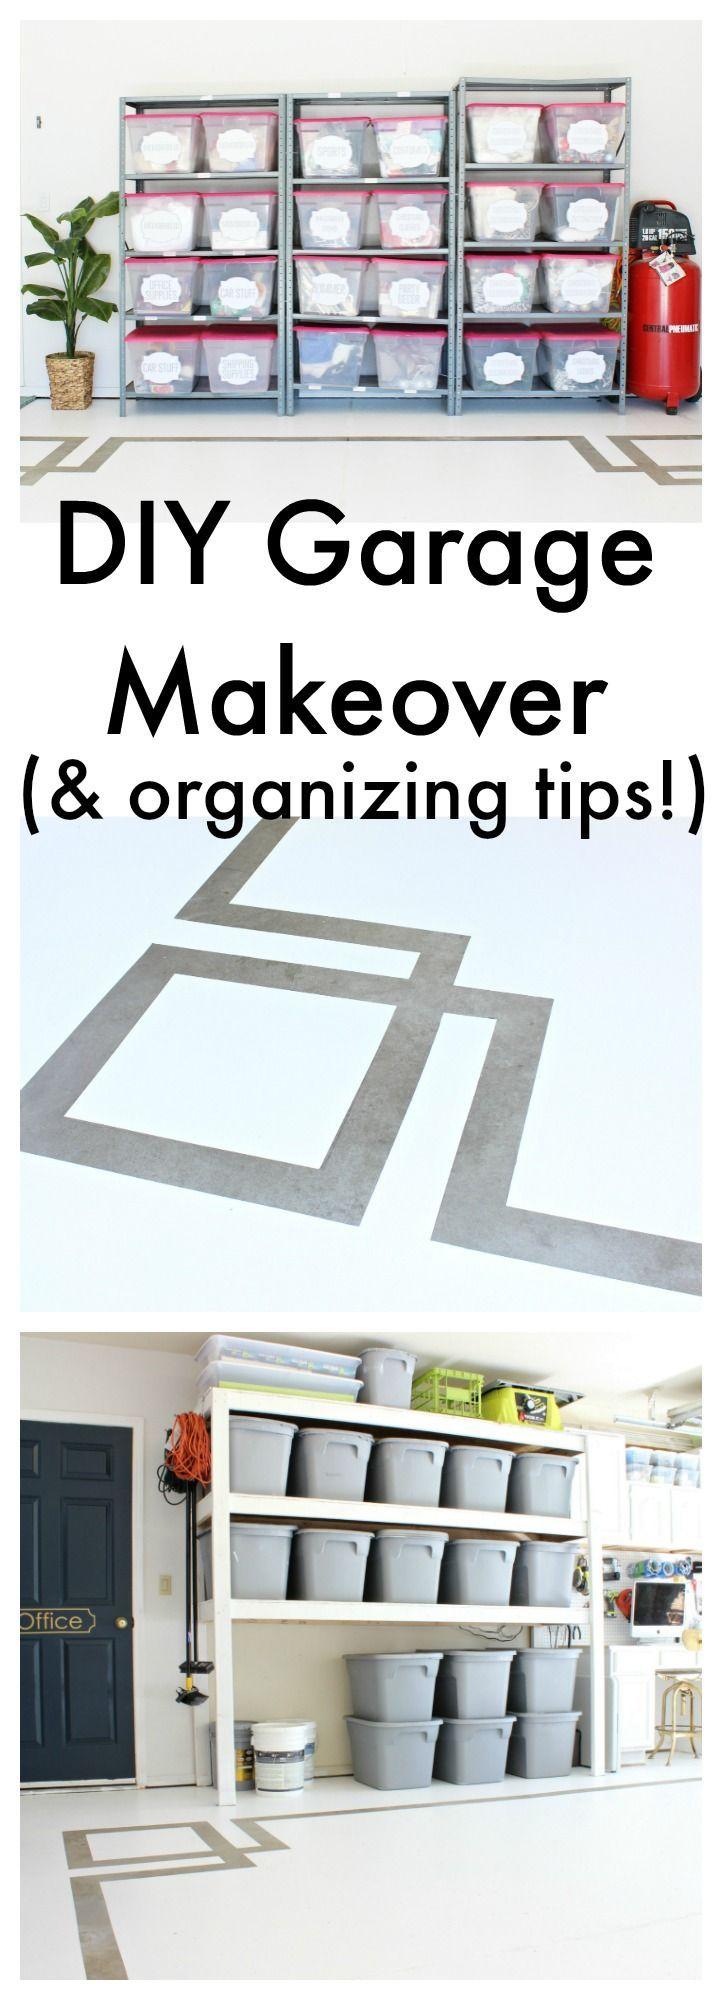 388 best garage makeover images on pinterest garage storage diy garage makeover and organizing tips www classyclutter solutioingenieria Images